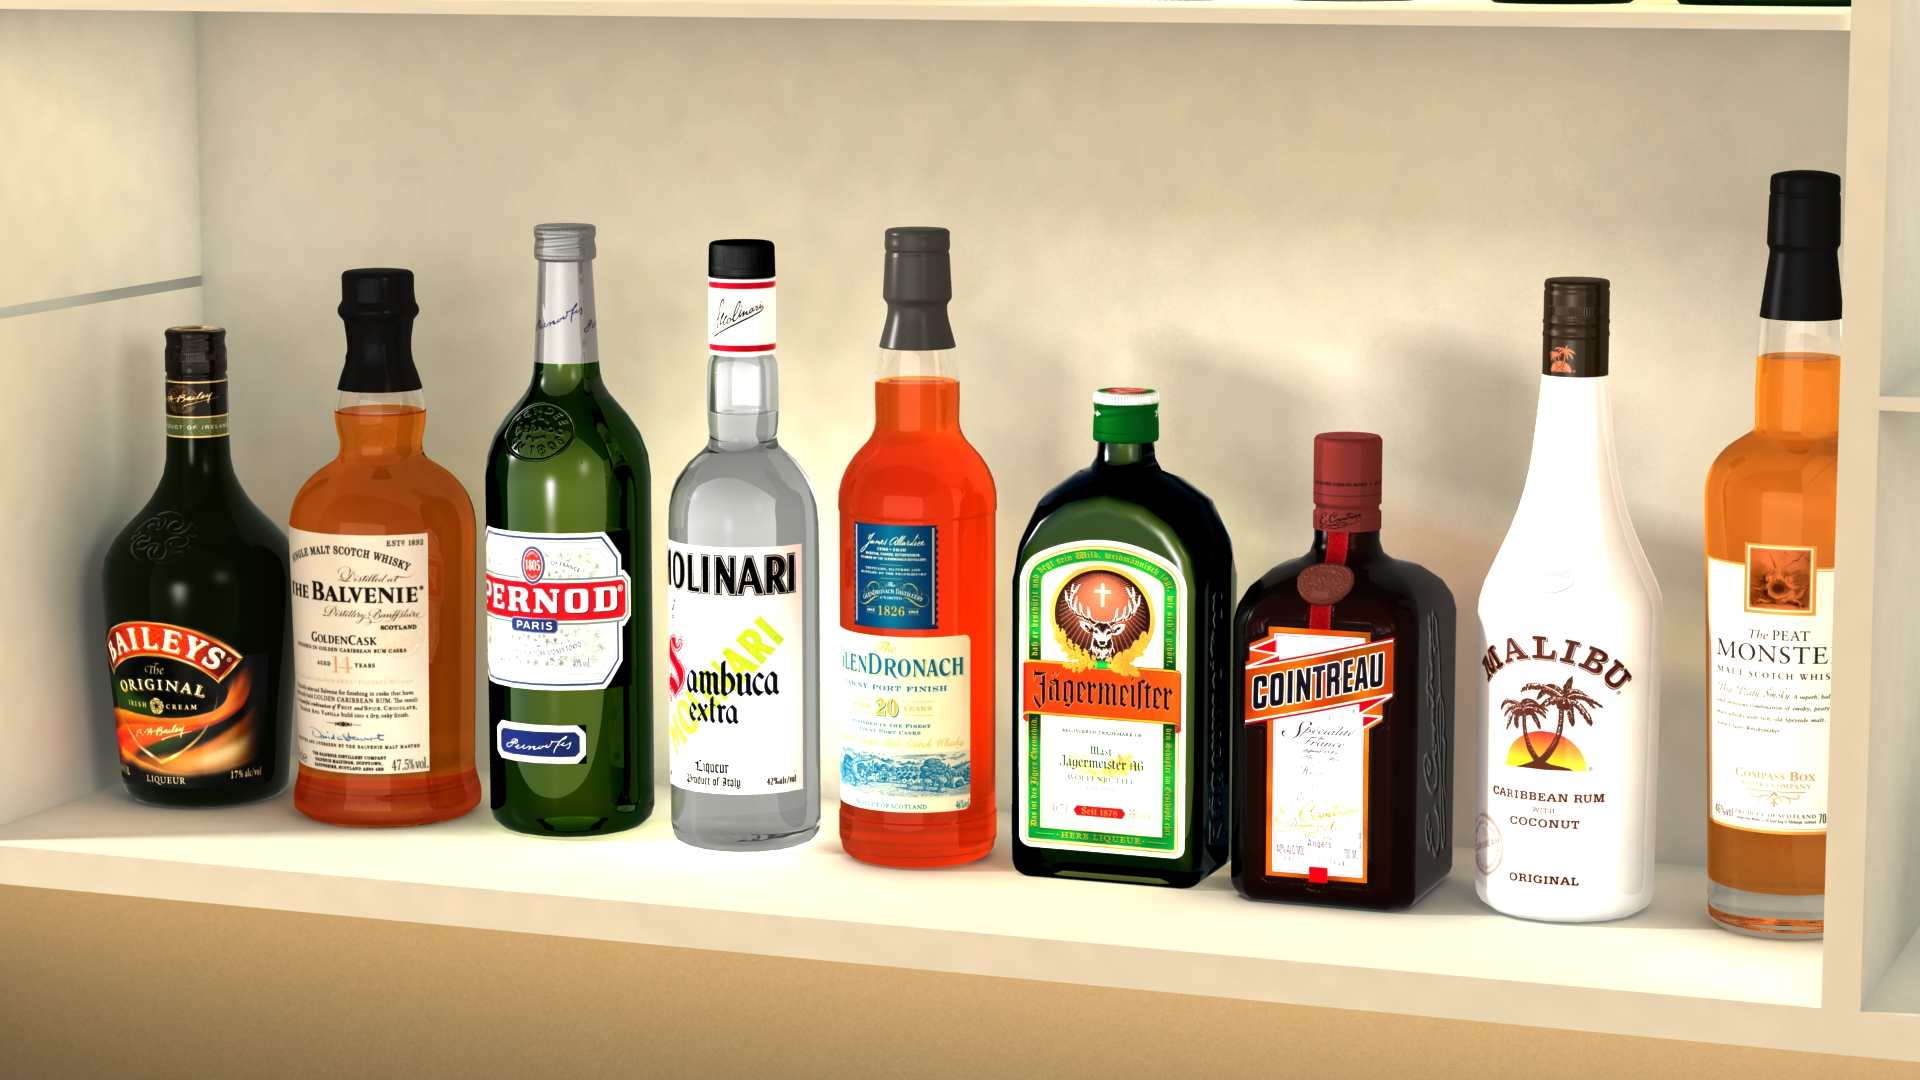 liquor bottles with bar unit interior vr/ar ready 3d model 3ds max  fbx jpeg jpg texture obj 279243